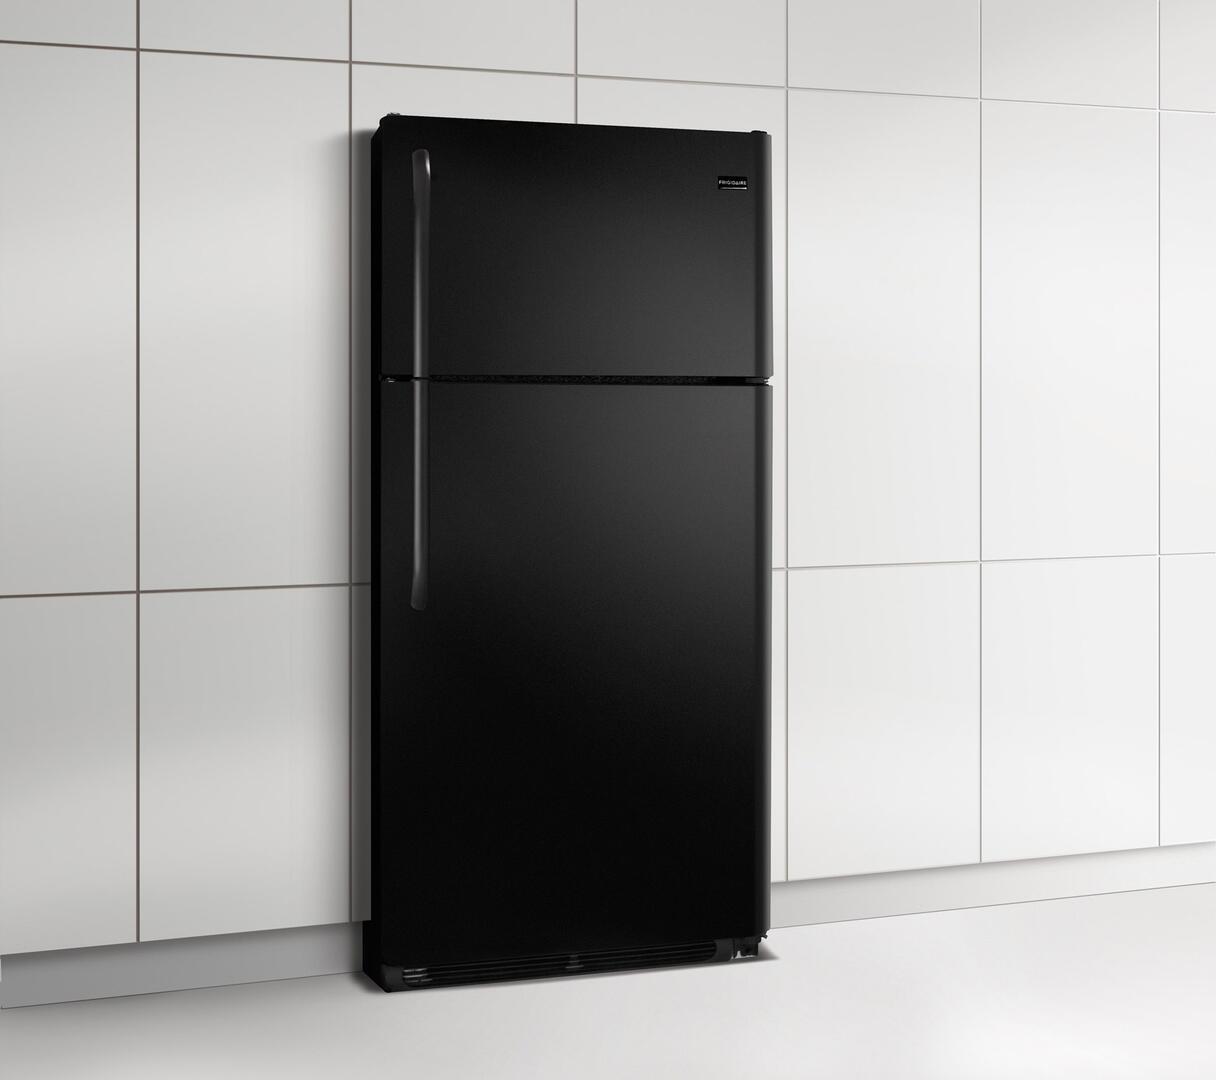 Frigidaire Fftr1814lb Refrigerator With 18 2 Cu Ft